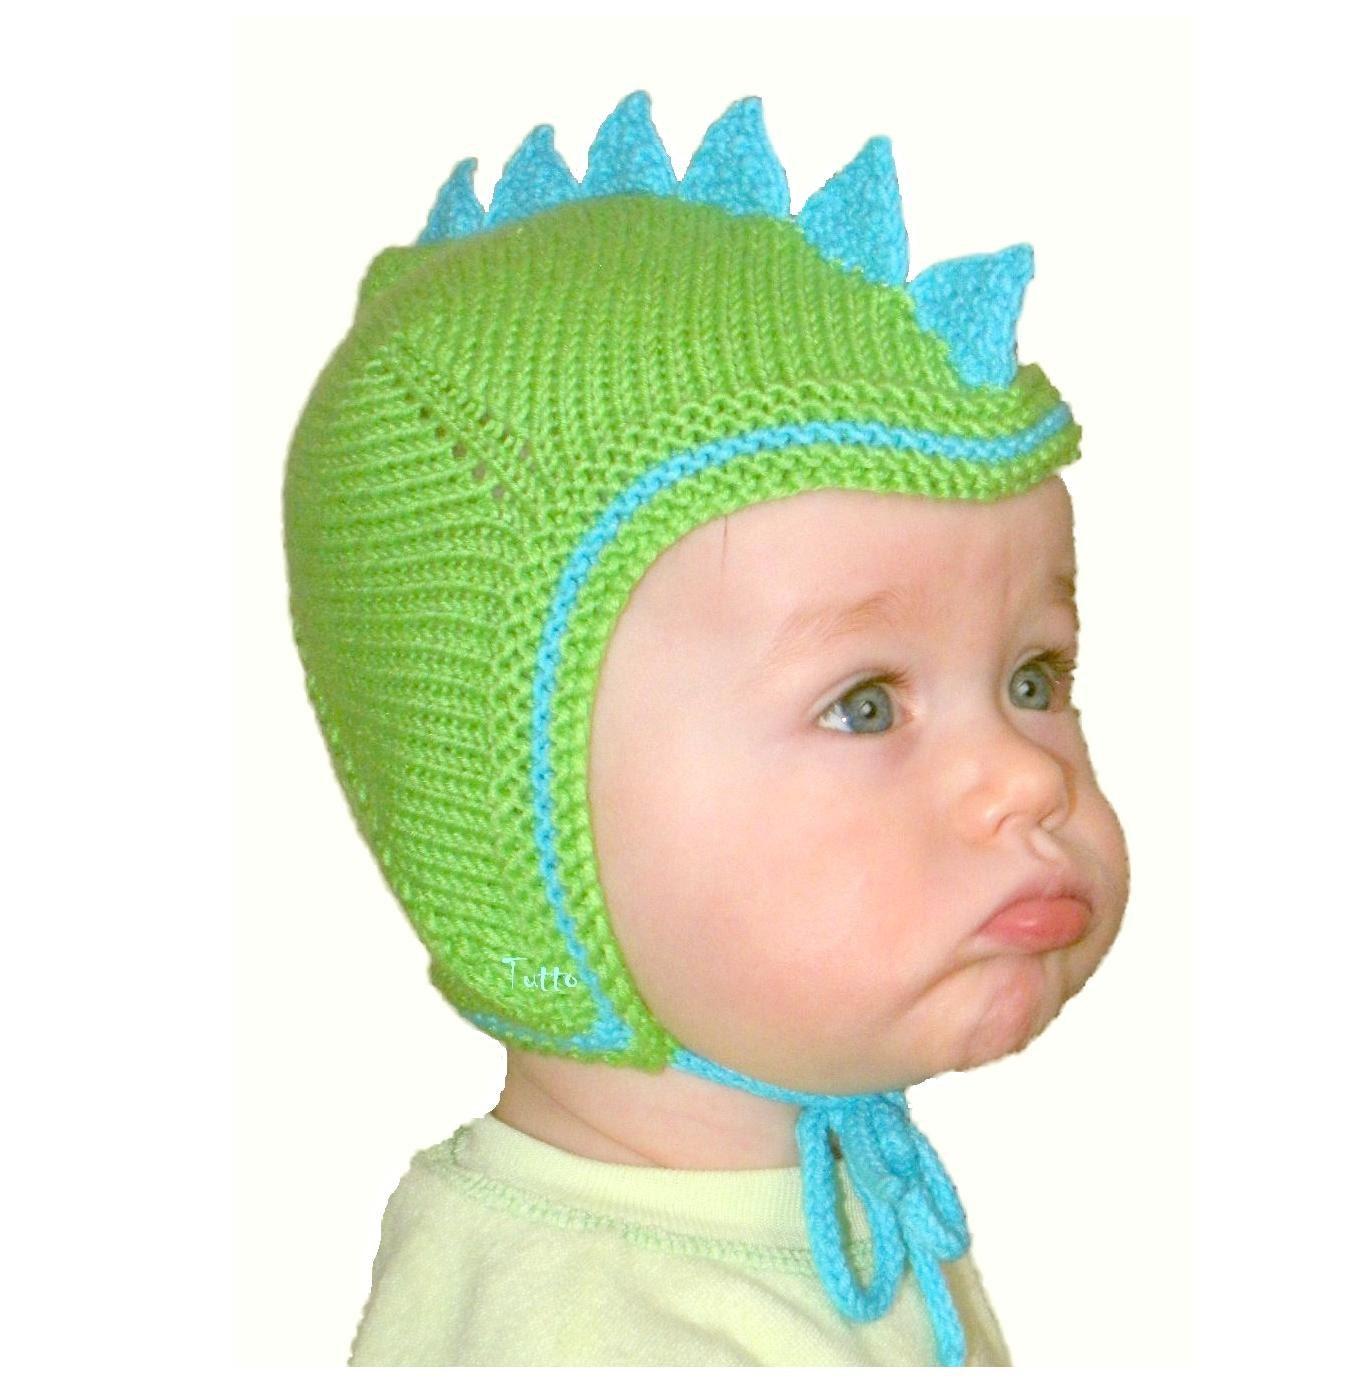 Newborn Dinosaur Hat Knitting Pattern : Bright green baby hat knit dinosaur hat knitted toddler hat